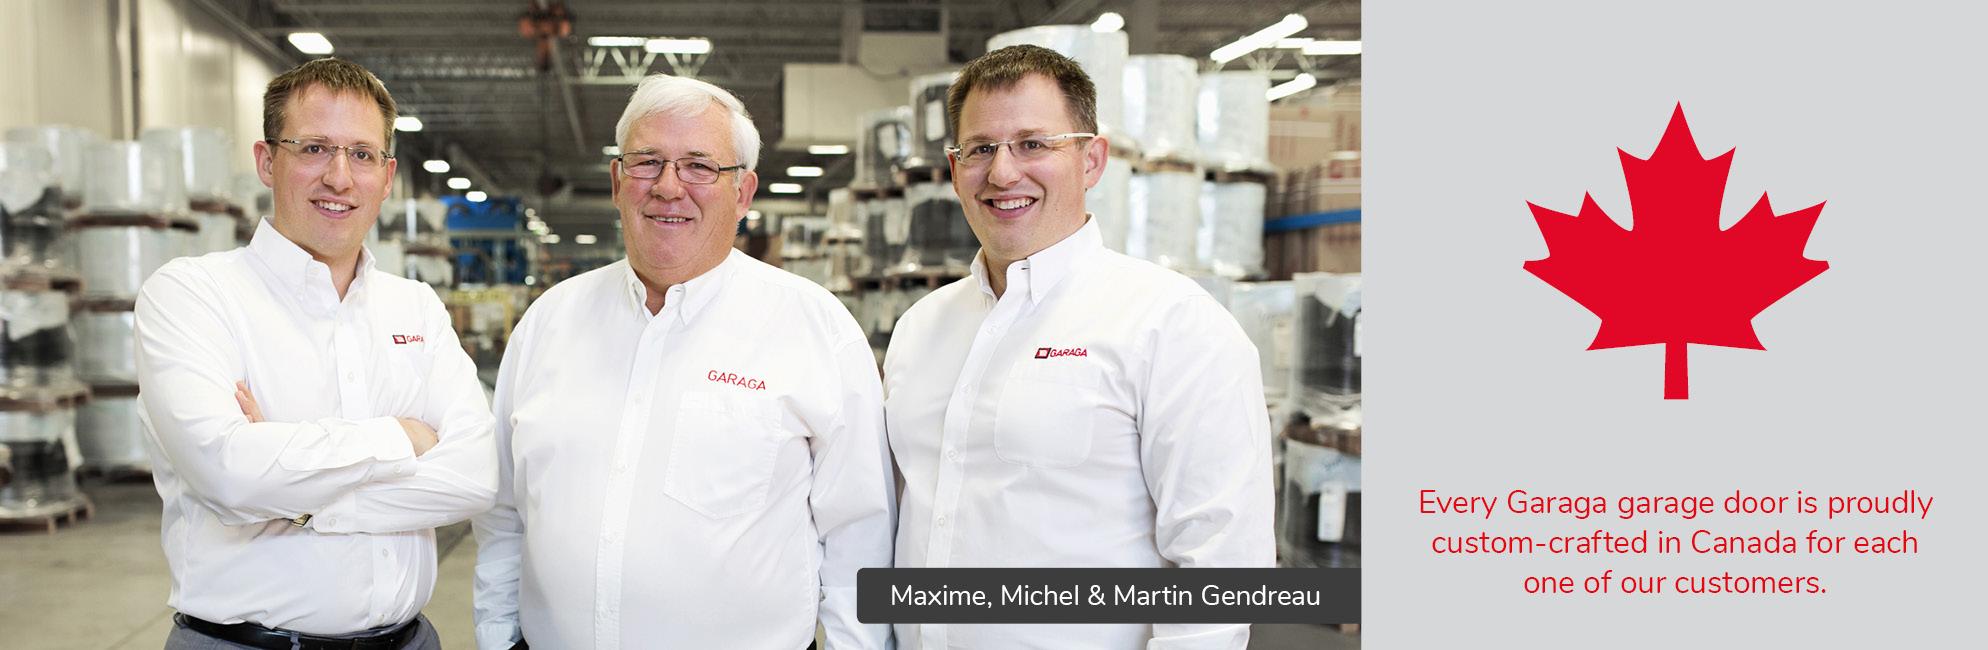 Maxime, Michel and Martin Gendreau